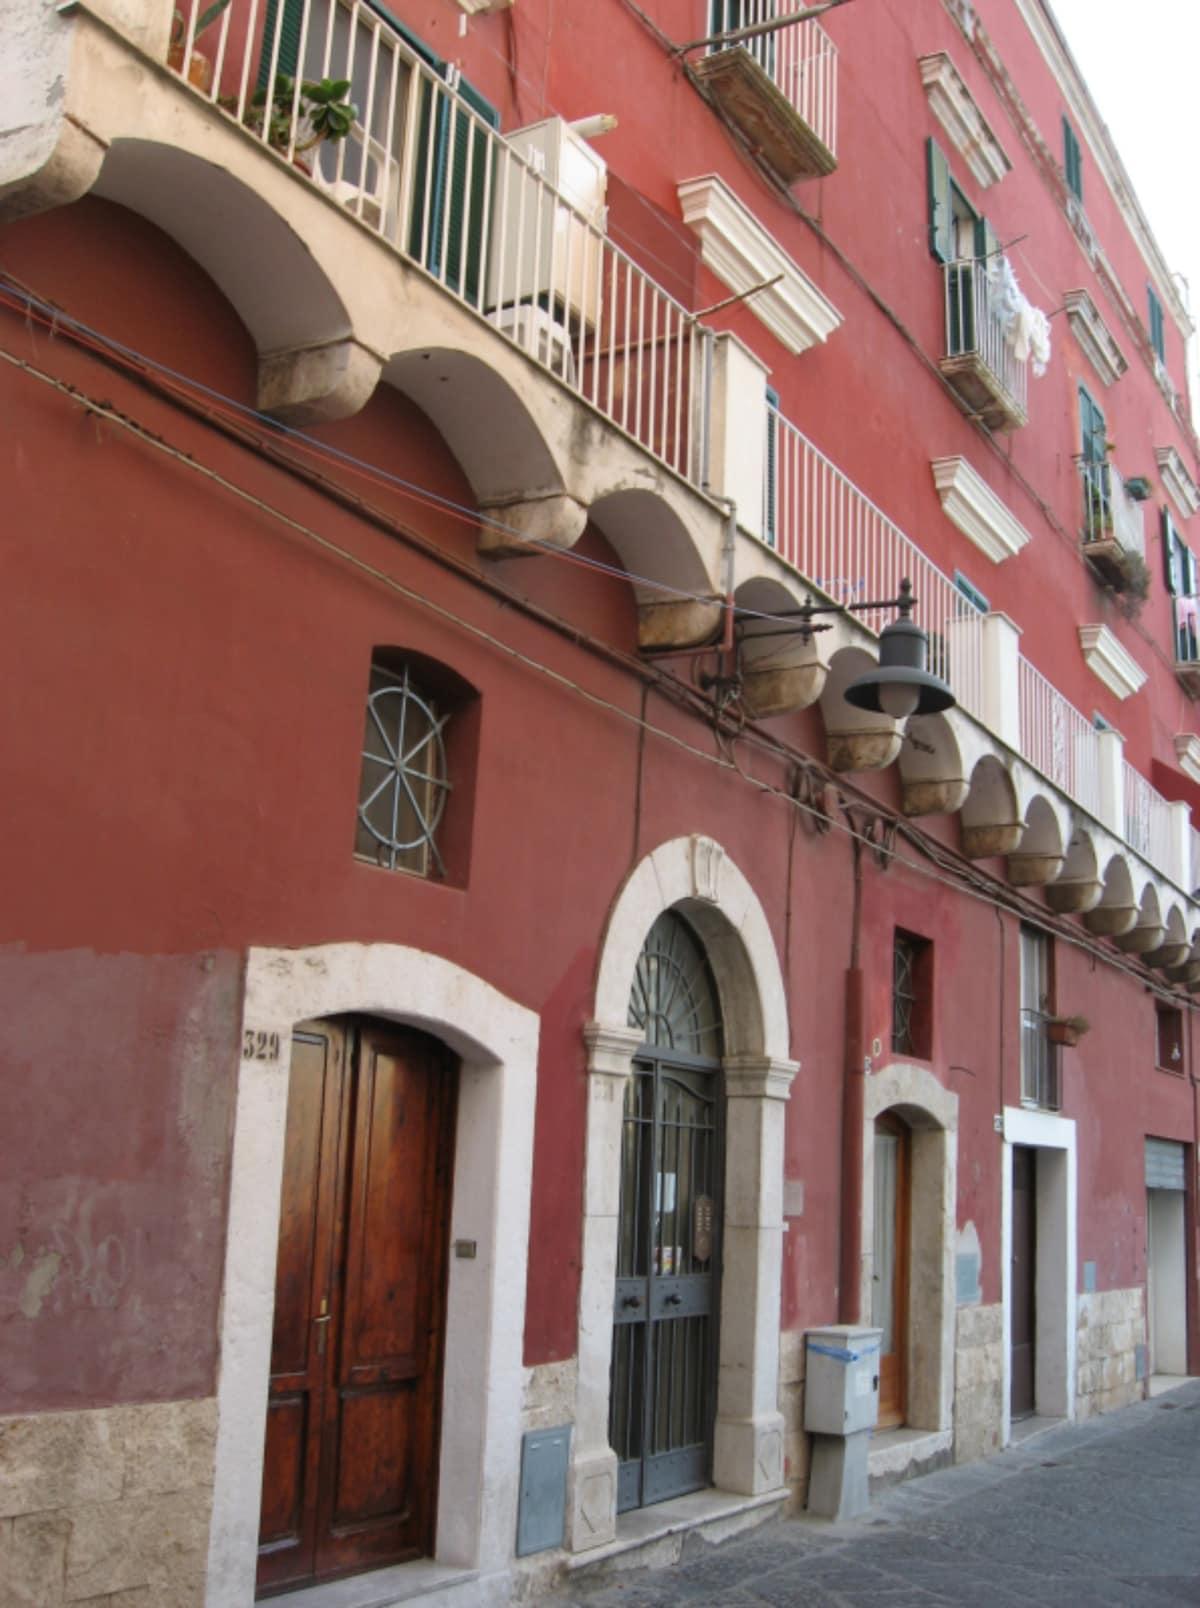 Lascesa from Gaeta